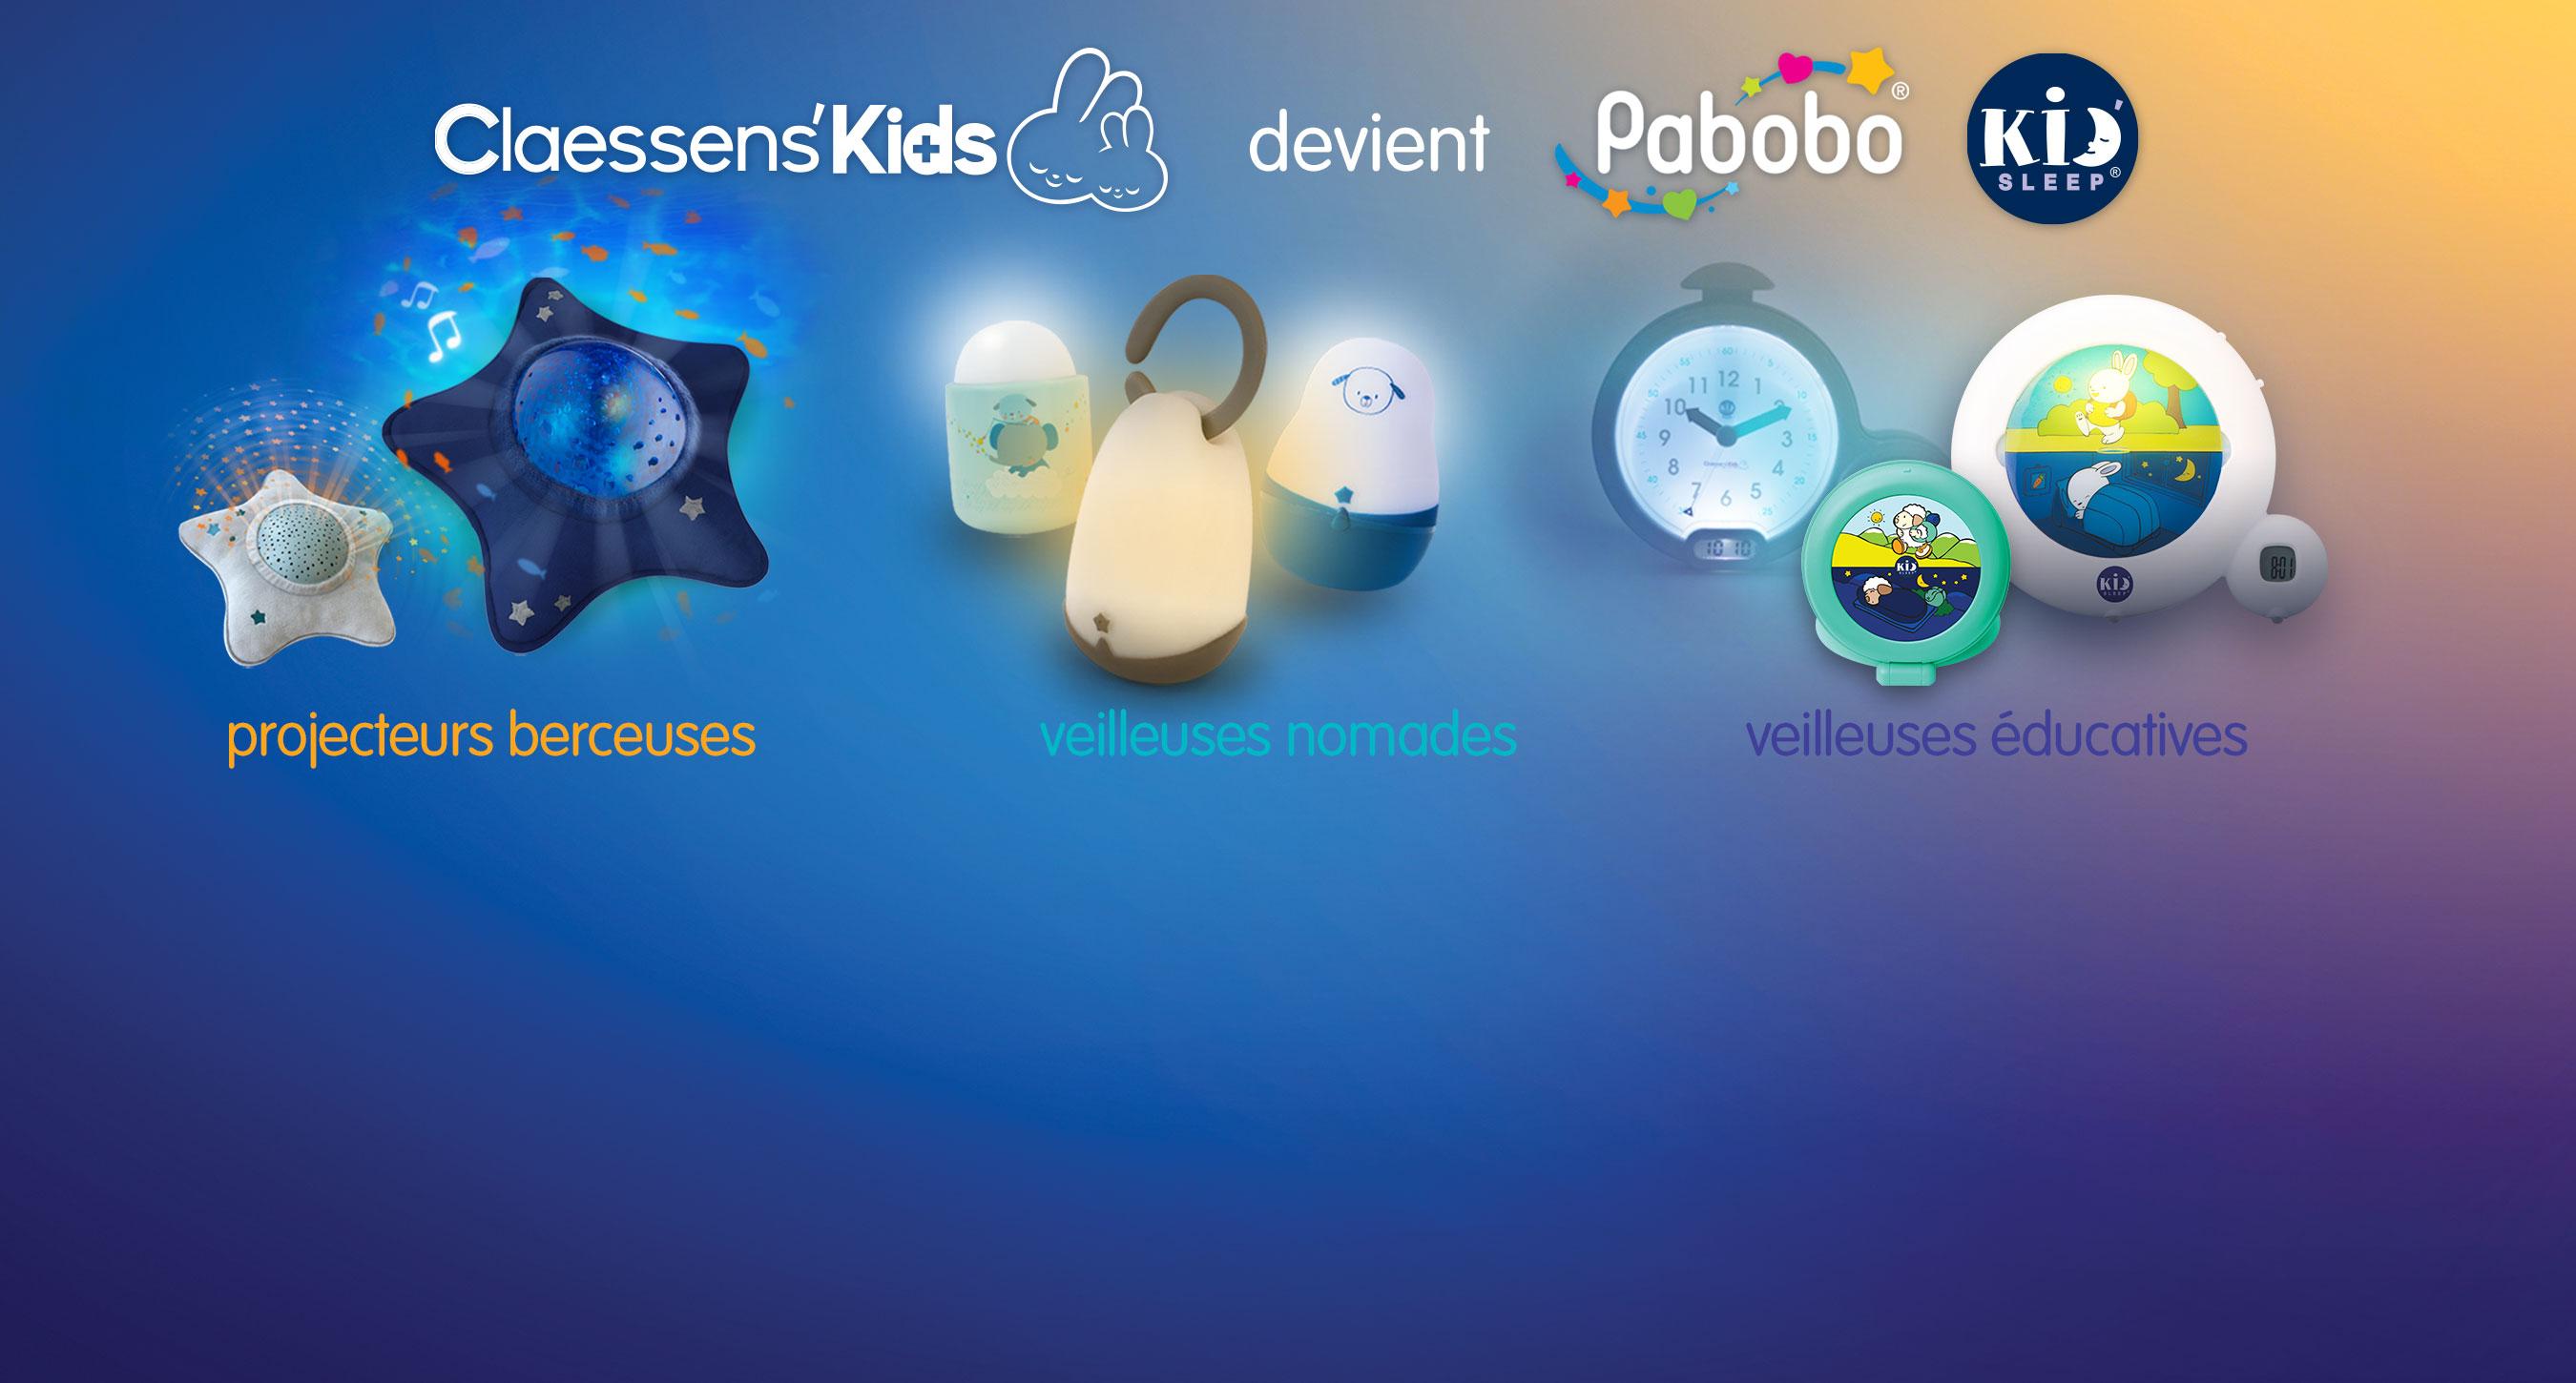 kidsleep-devient-pabobo-2700x1450-2